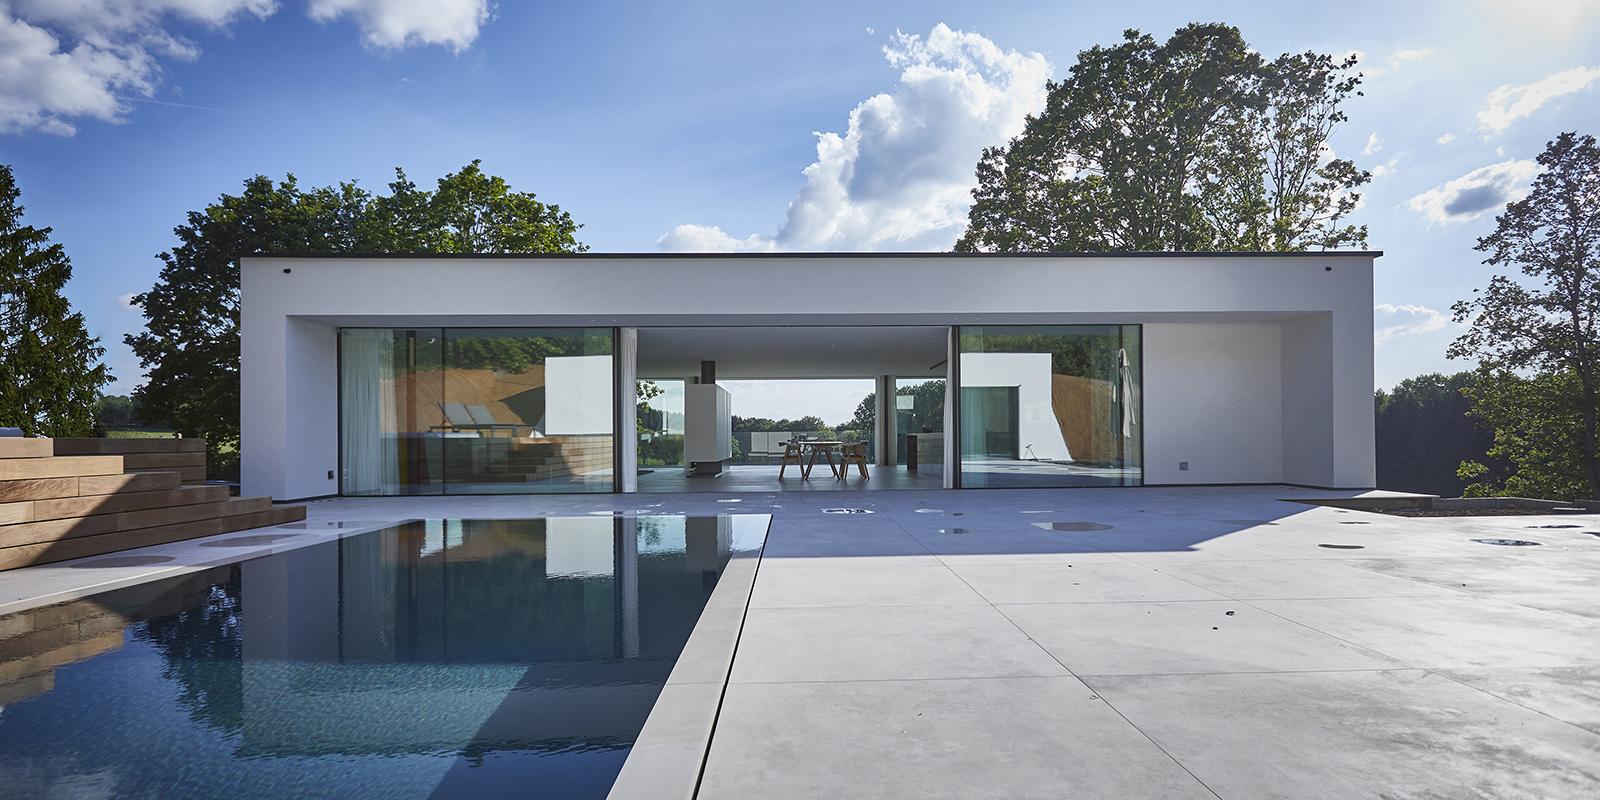 Nieuwbouwwoning, Group Ceyssenss, woning, huis, The Art of Living